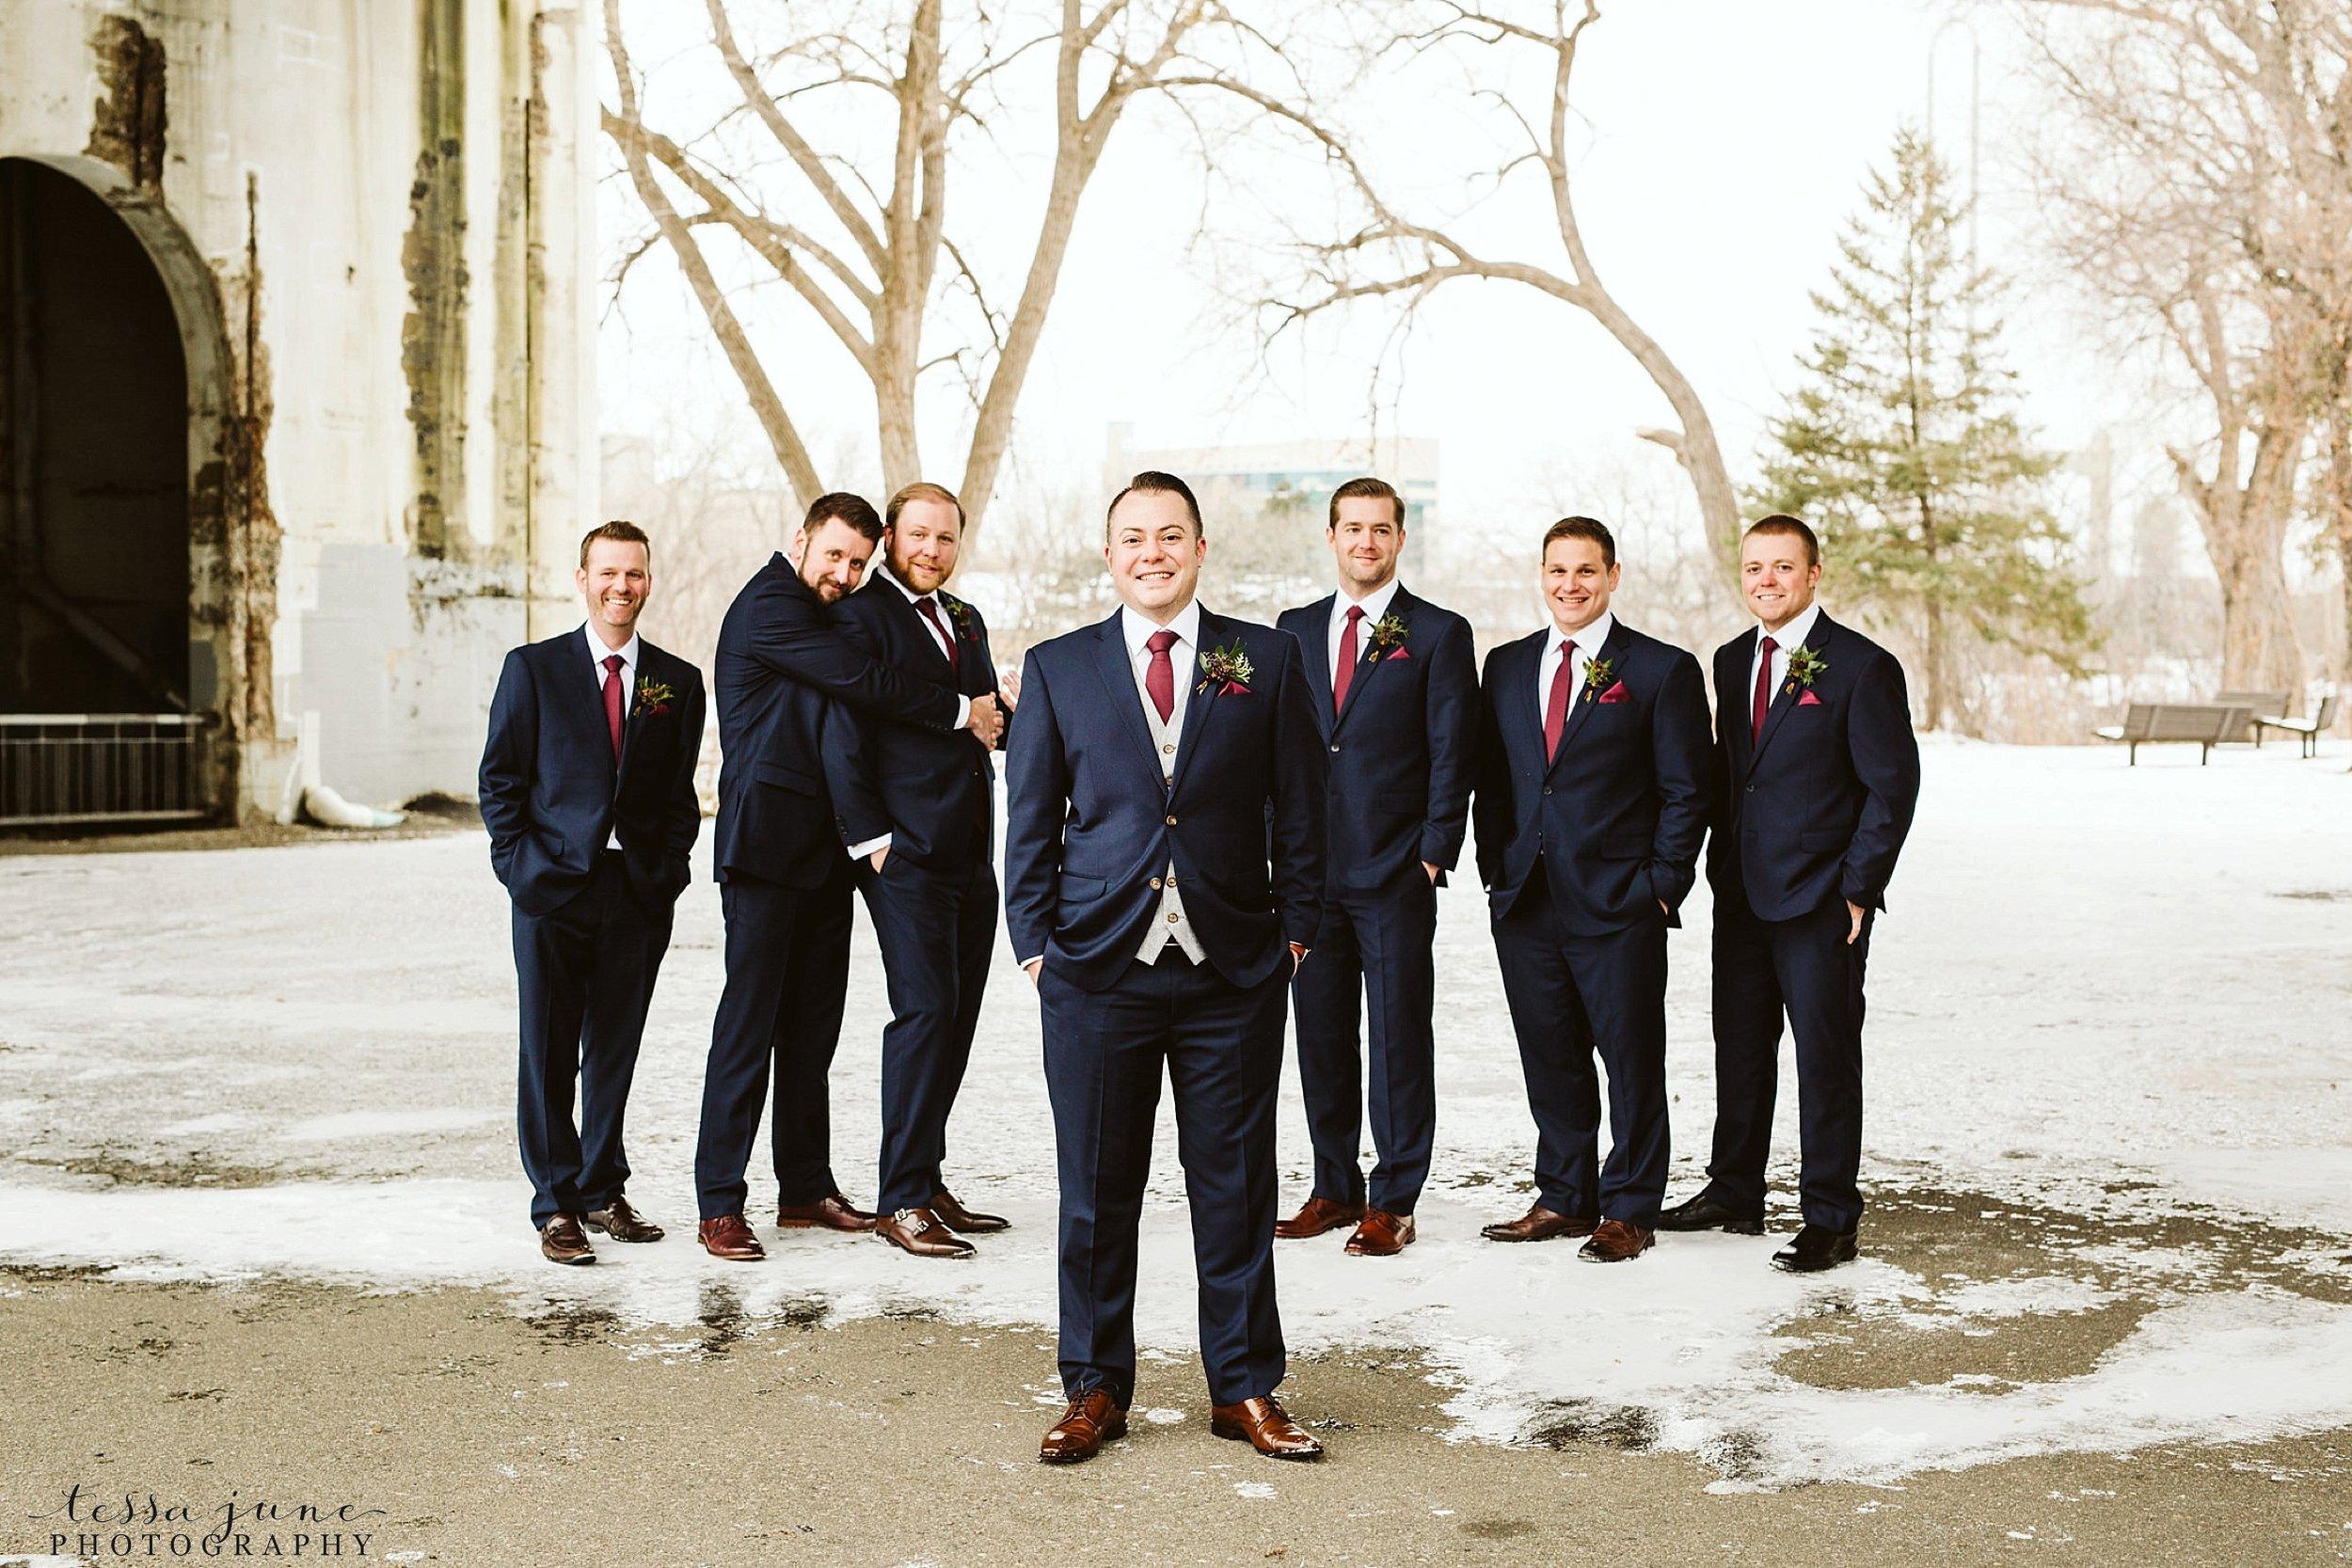 minneapolis-event-center-winter-romantic-snow-wedding-december-107.jpg